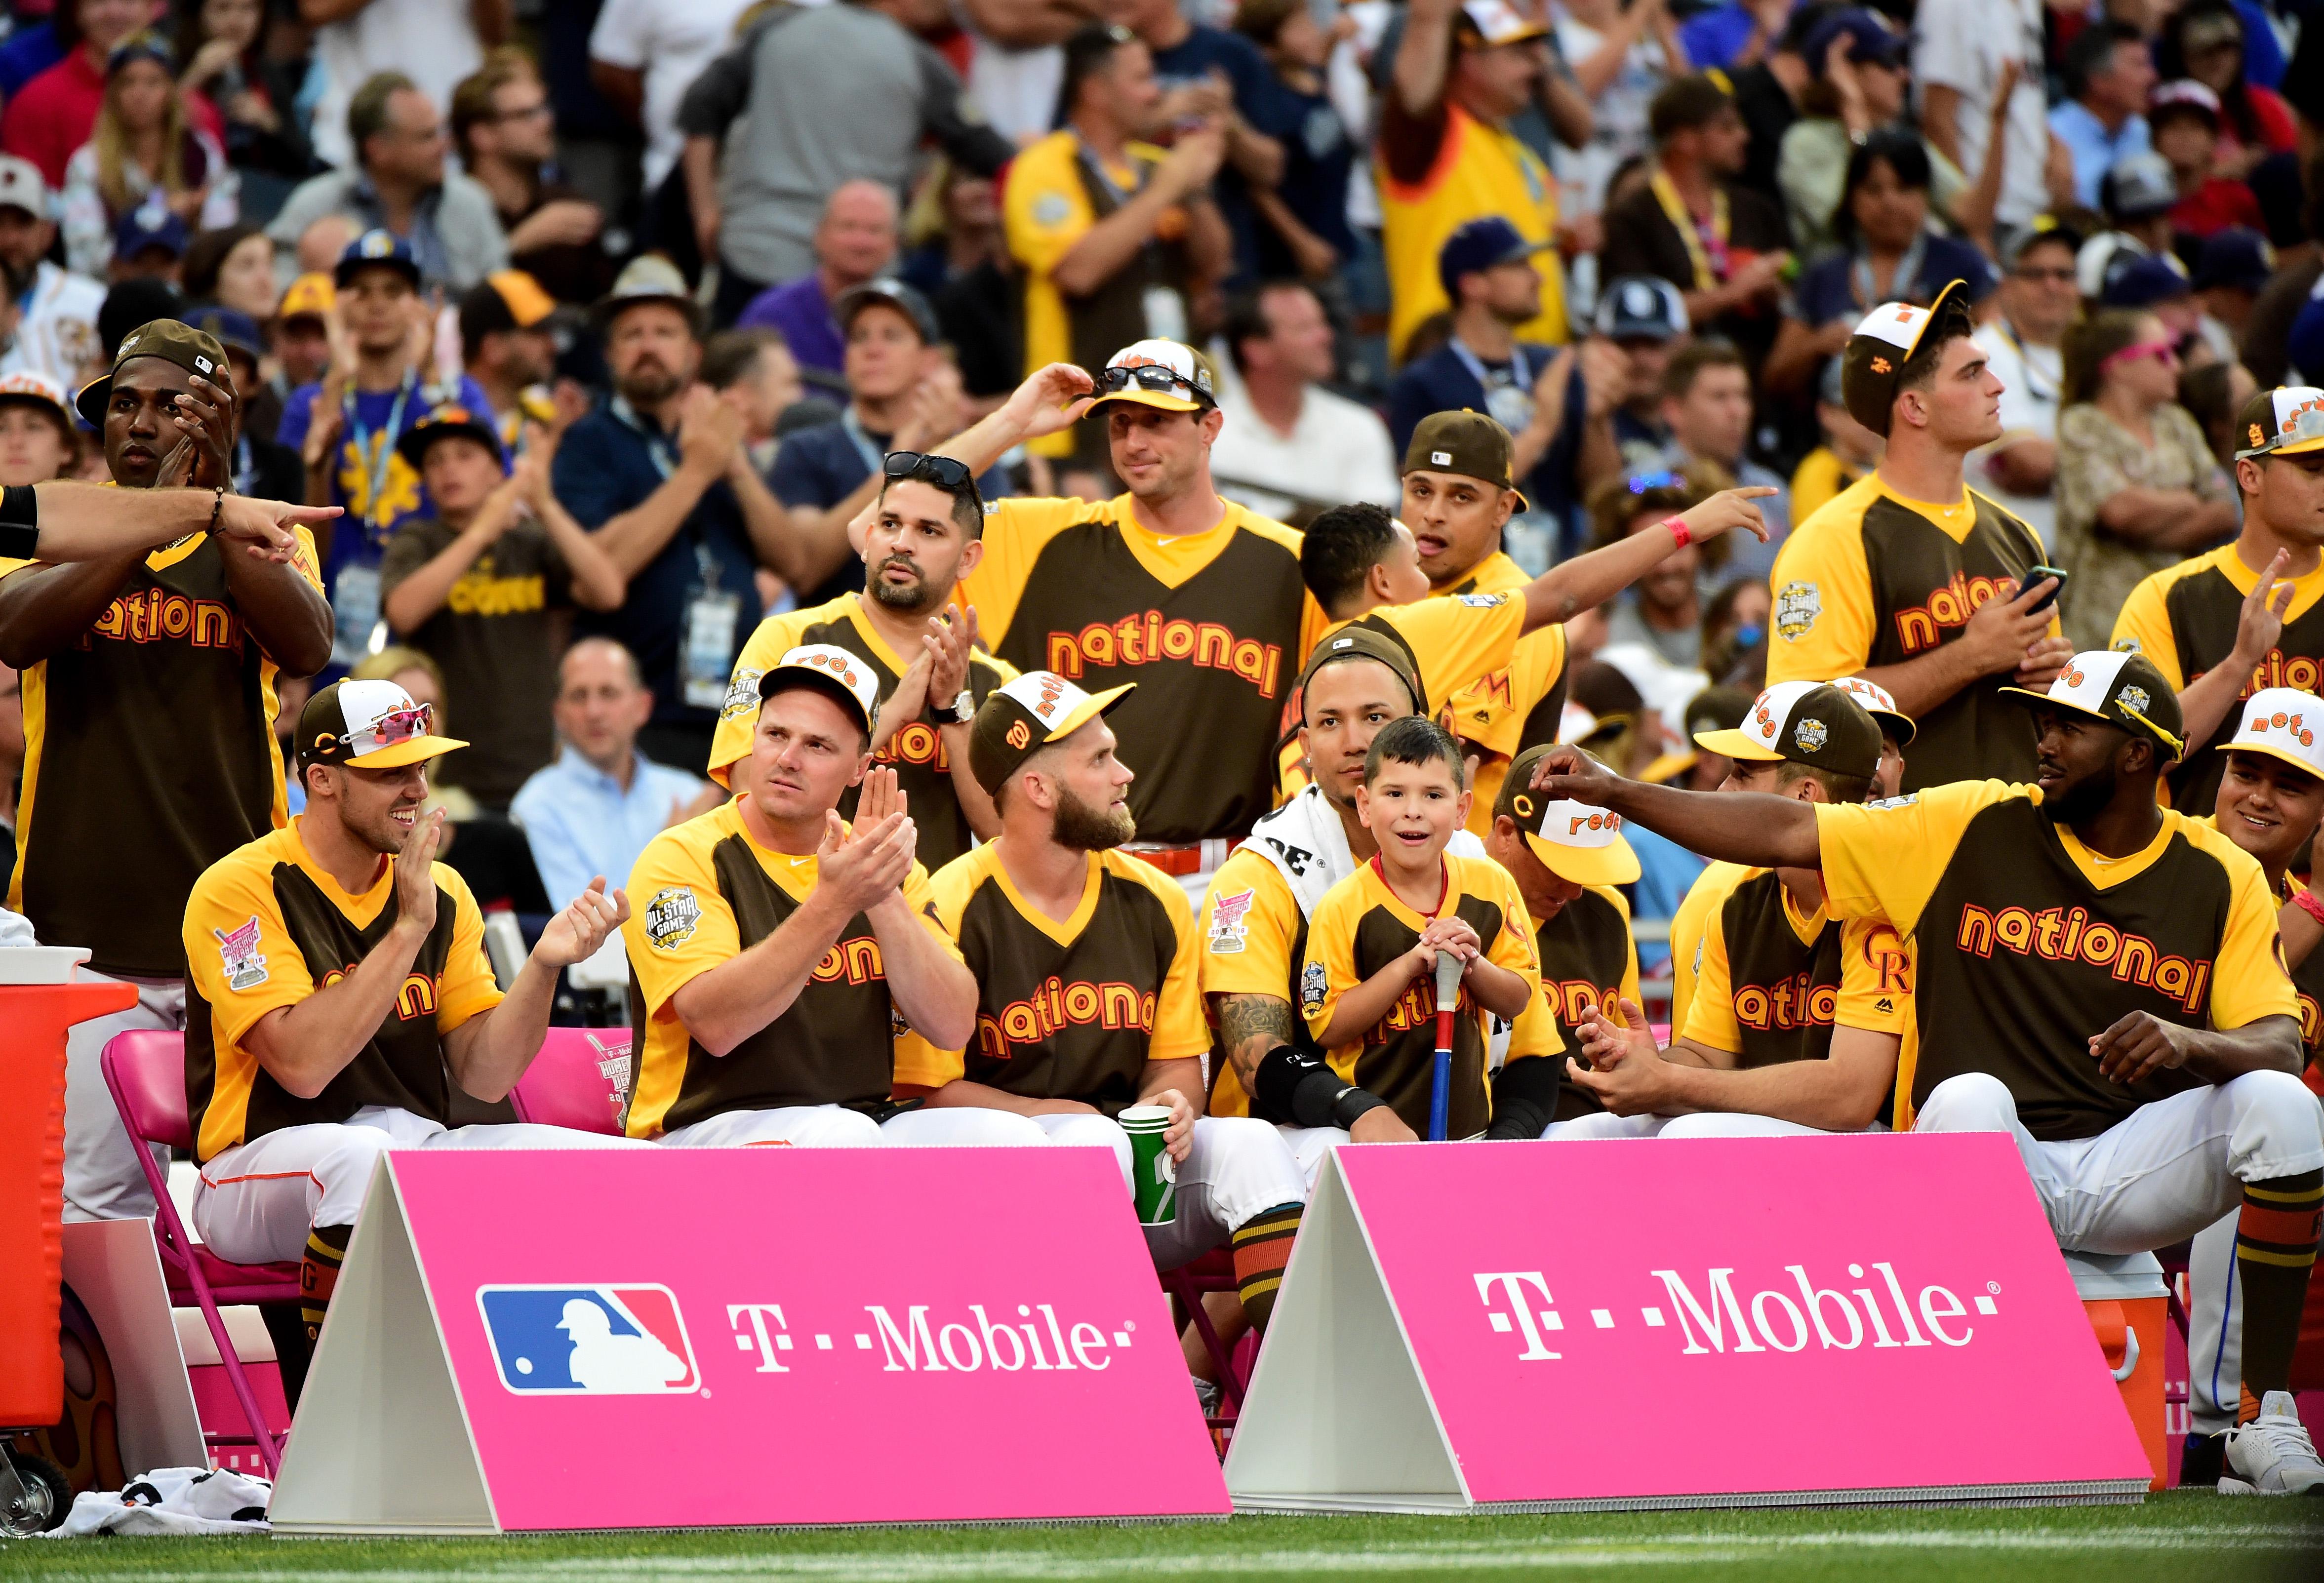 All-Star Game, MLB, Petco Park, San Diego